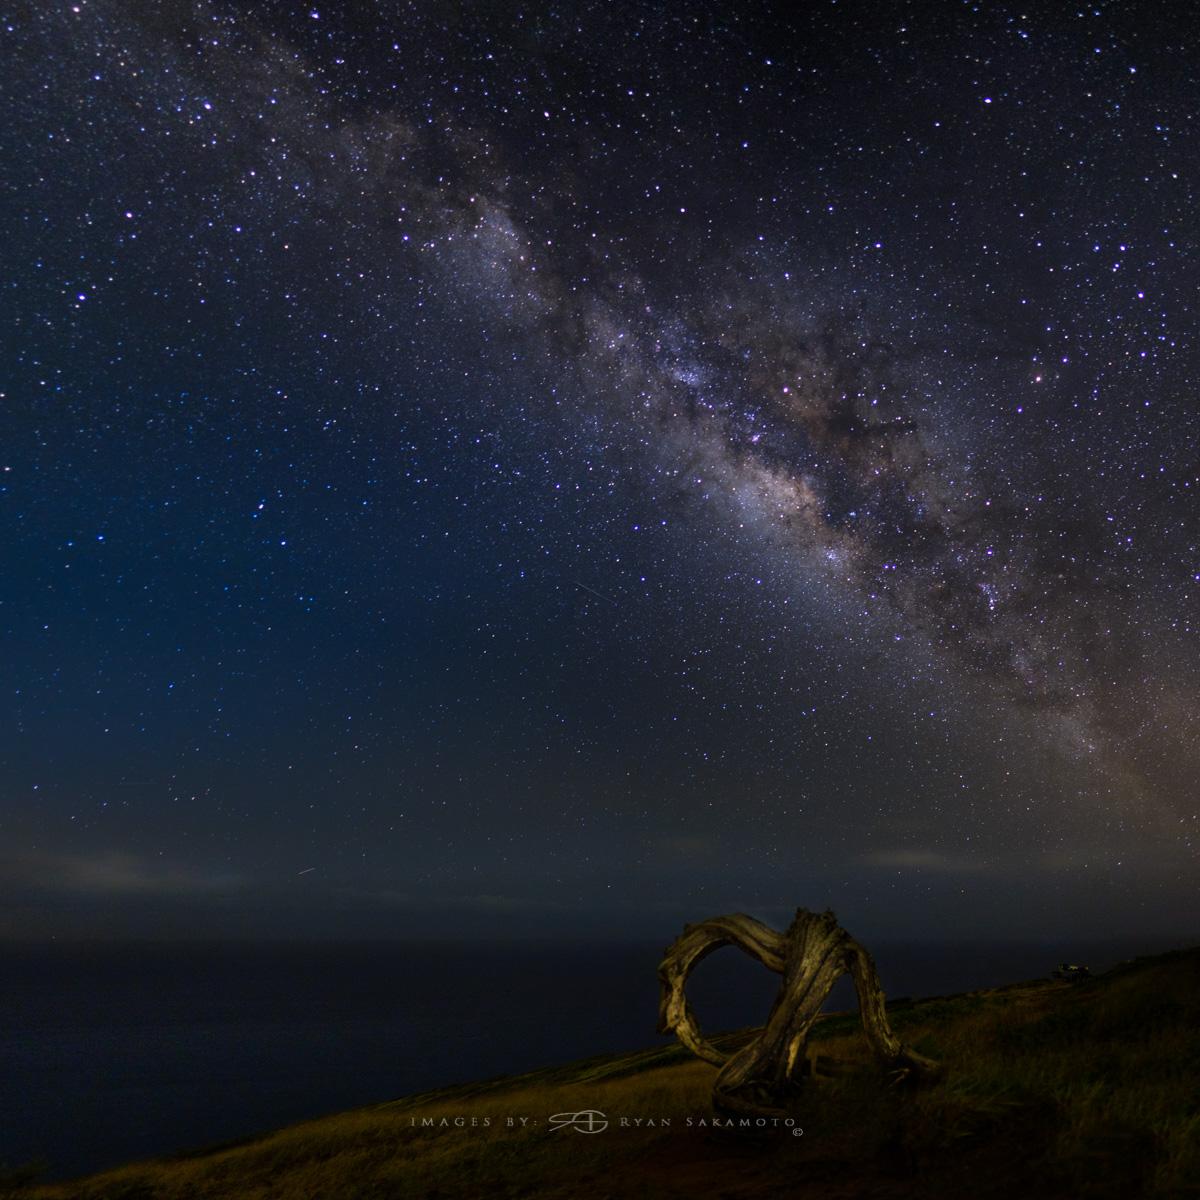 Milky Way from the top of Hanauma Bay Honolulu,Hawaii  Fuji XT2  |  30 sec. |  f/1.4  |  ISO 640  |   XF16mm f/1.4 R WR   Edited in Lightroom & Photoshop CC 2017